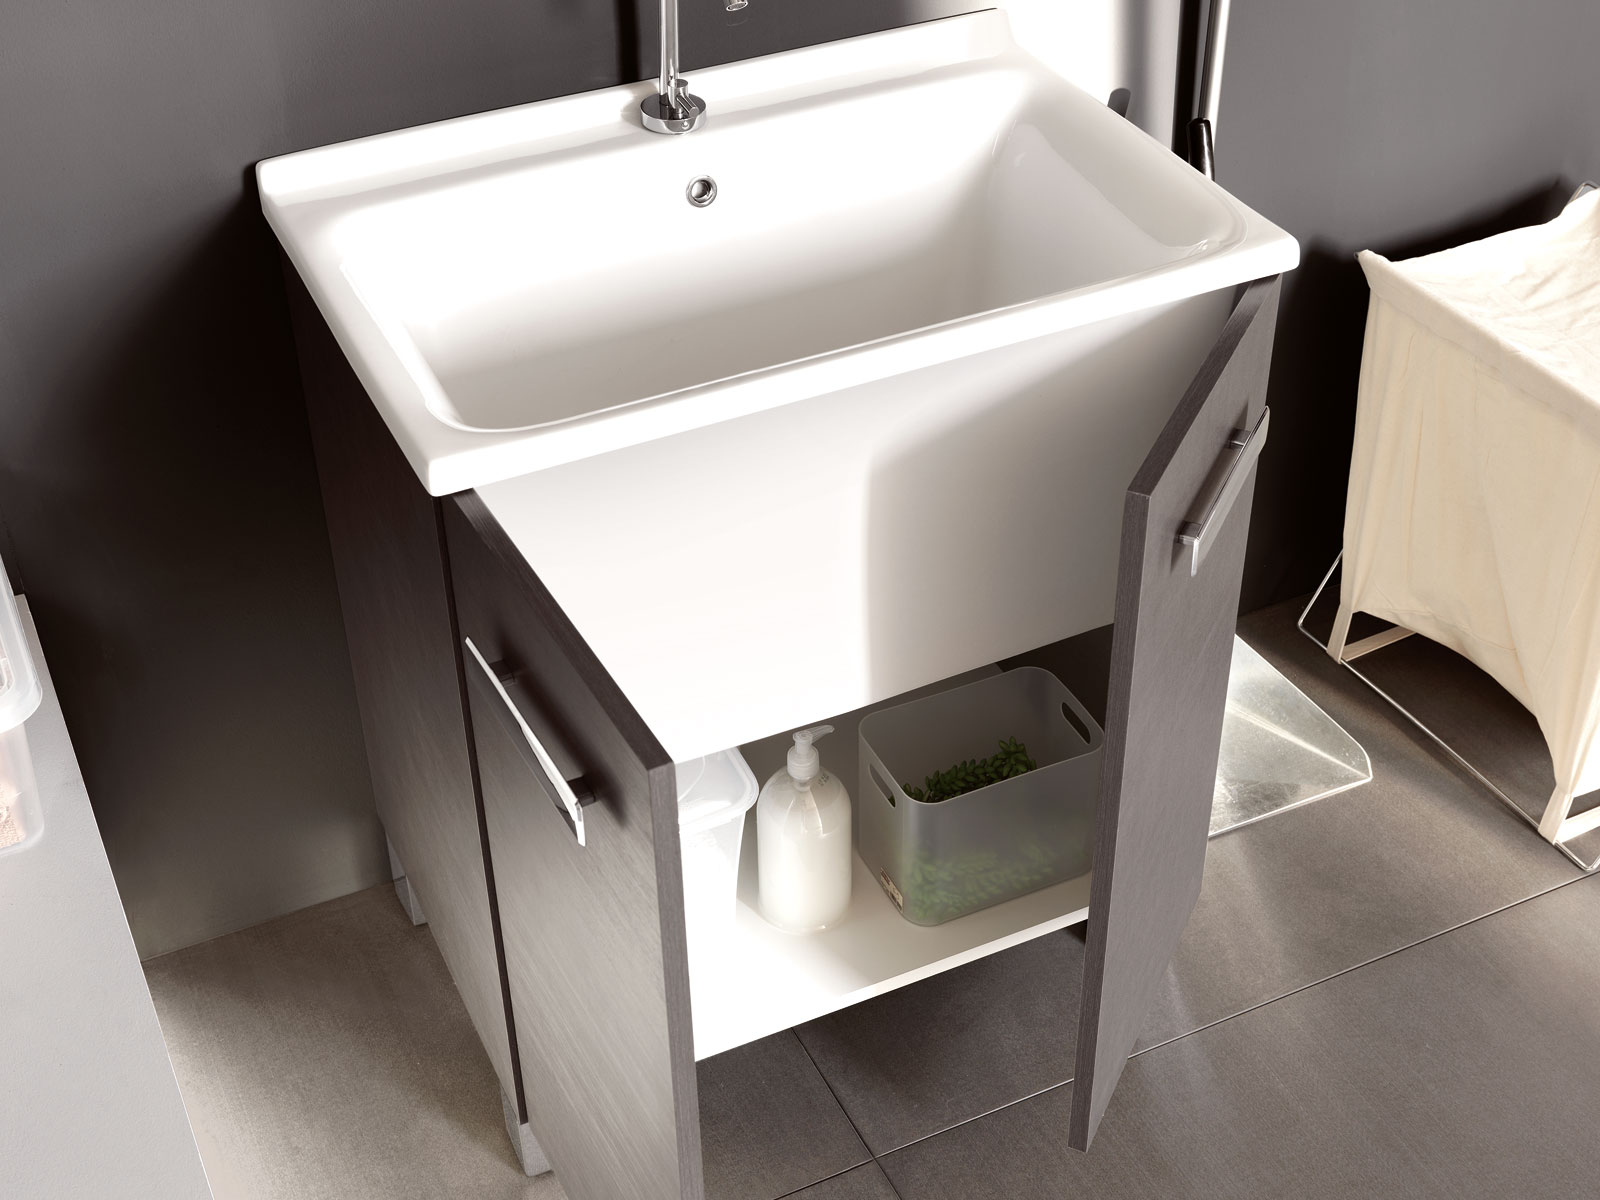 Bagno lavatrice ~ avienix.com for .